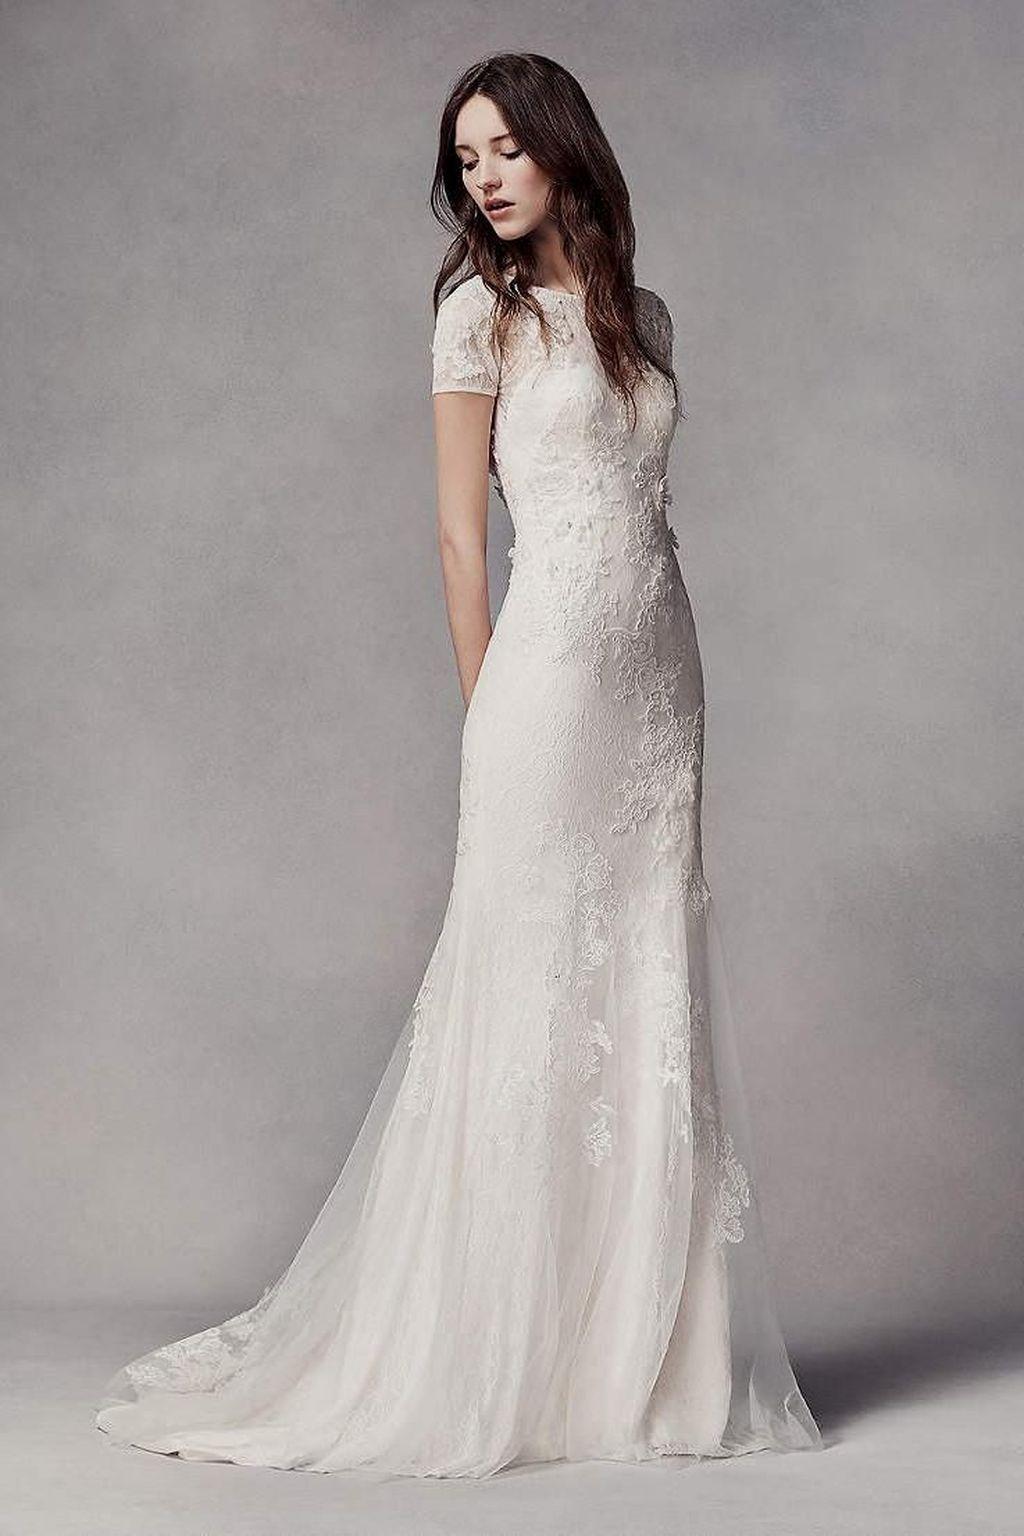 50 Latest White Beach Dresses Ideas For Wedding in 2020